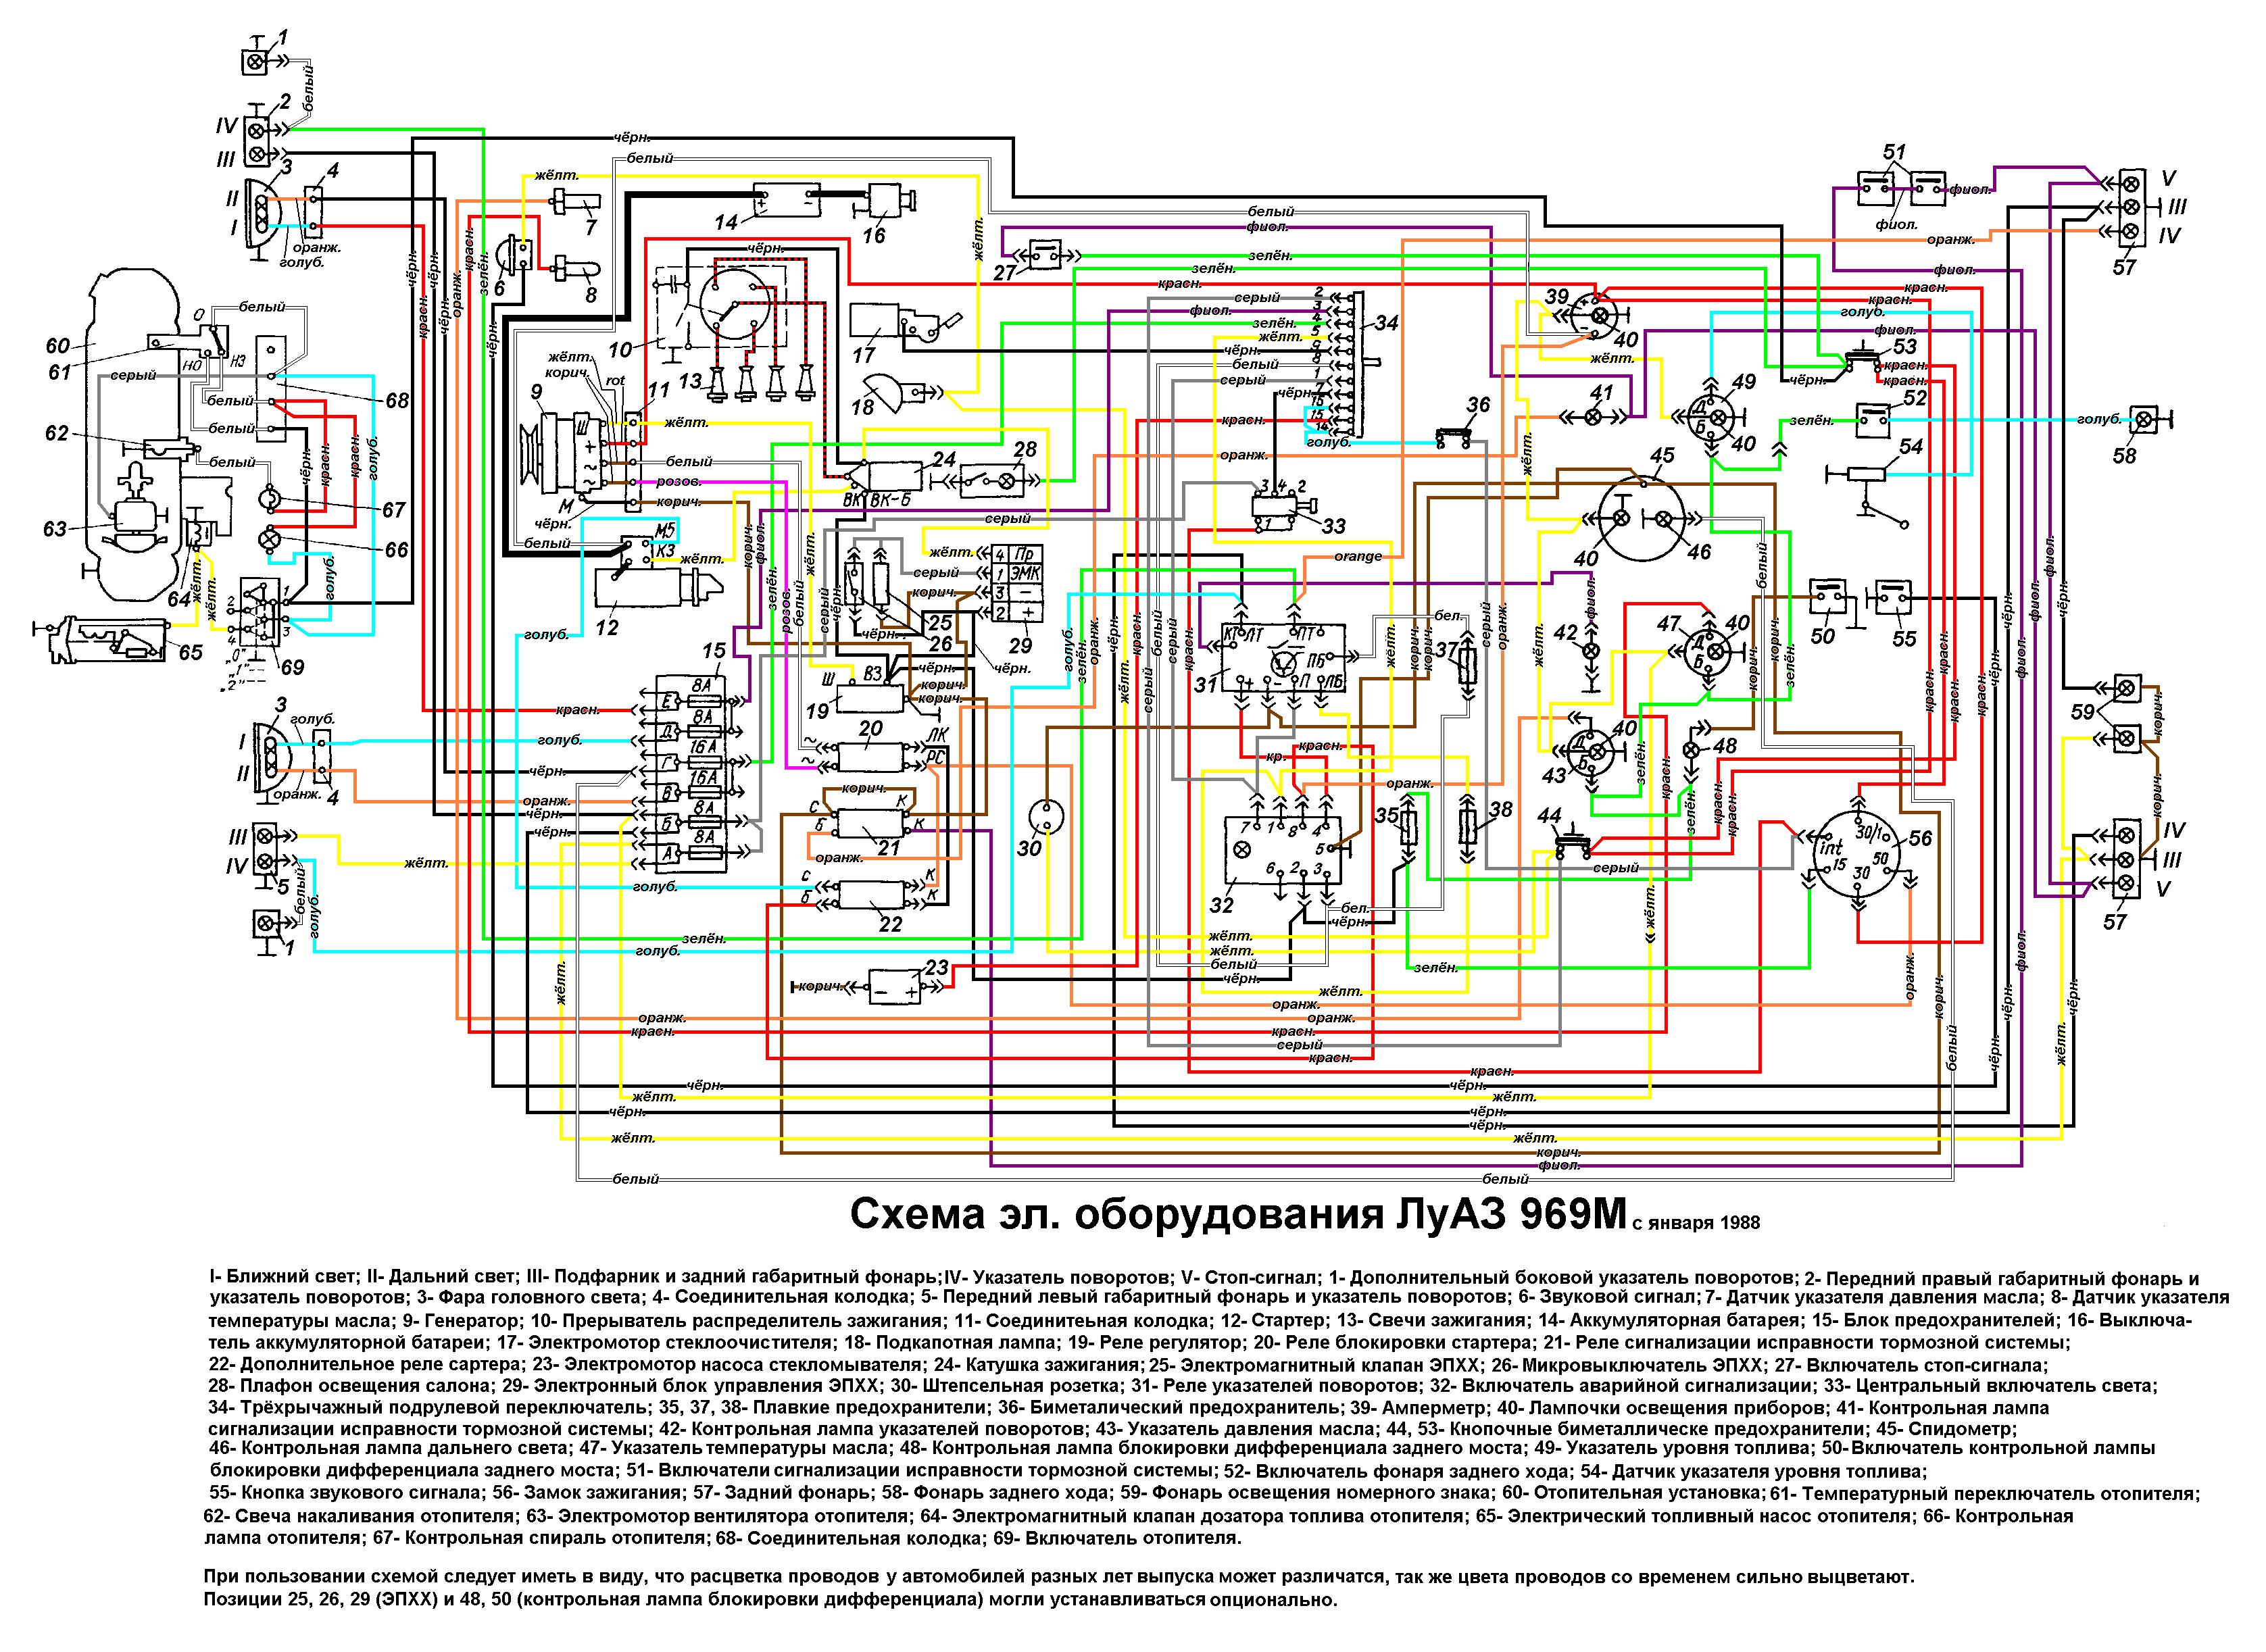 цветная электросхема газ 53